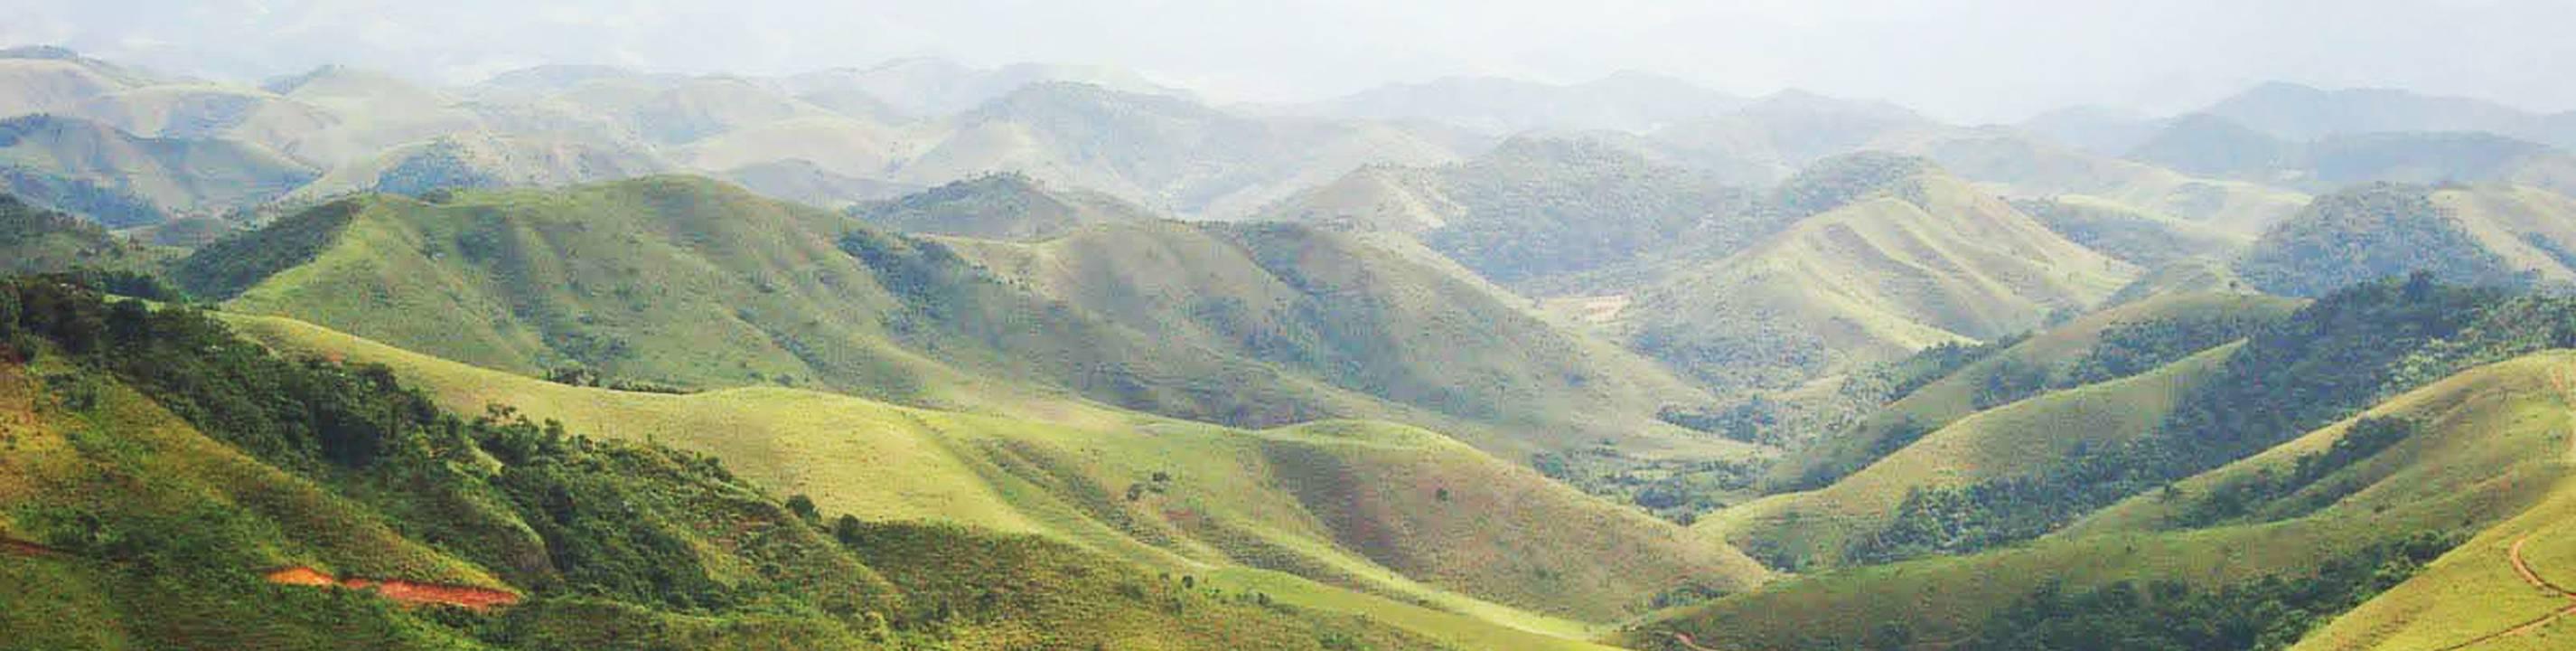 Pousada Serras Verdes